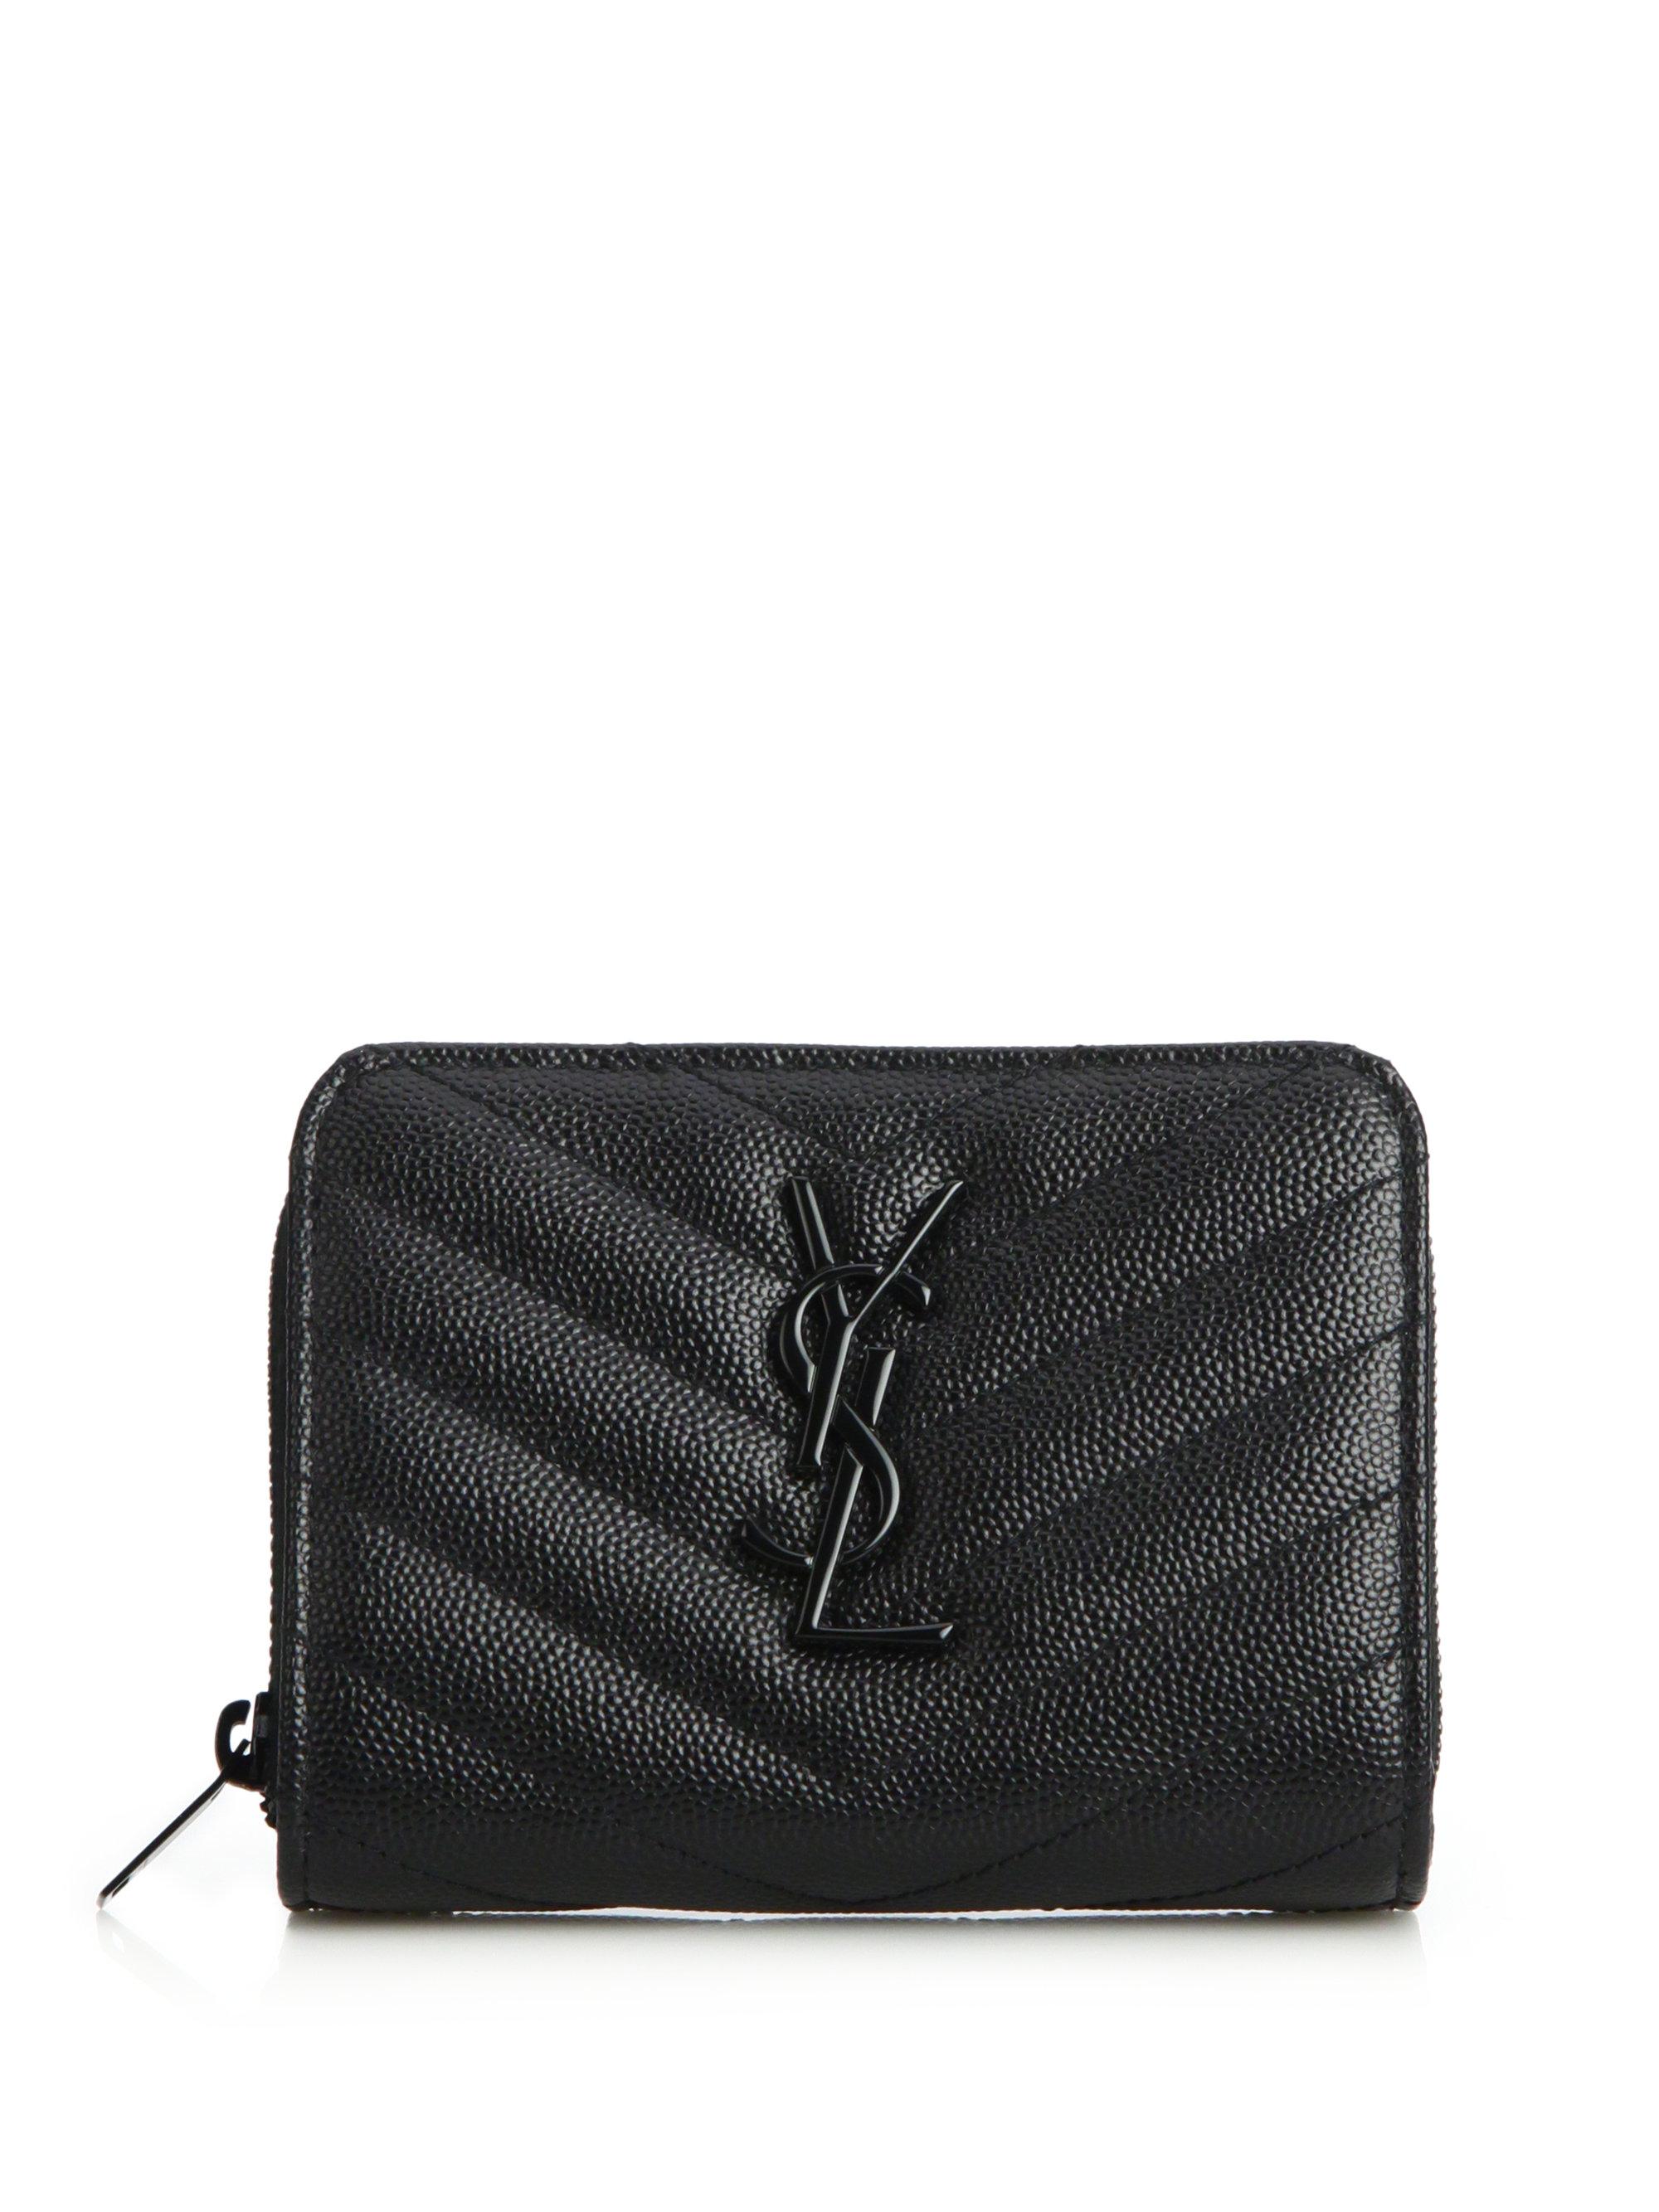 Yves Saint Laurent Monogramme Zip Around Wallet Ysl